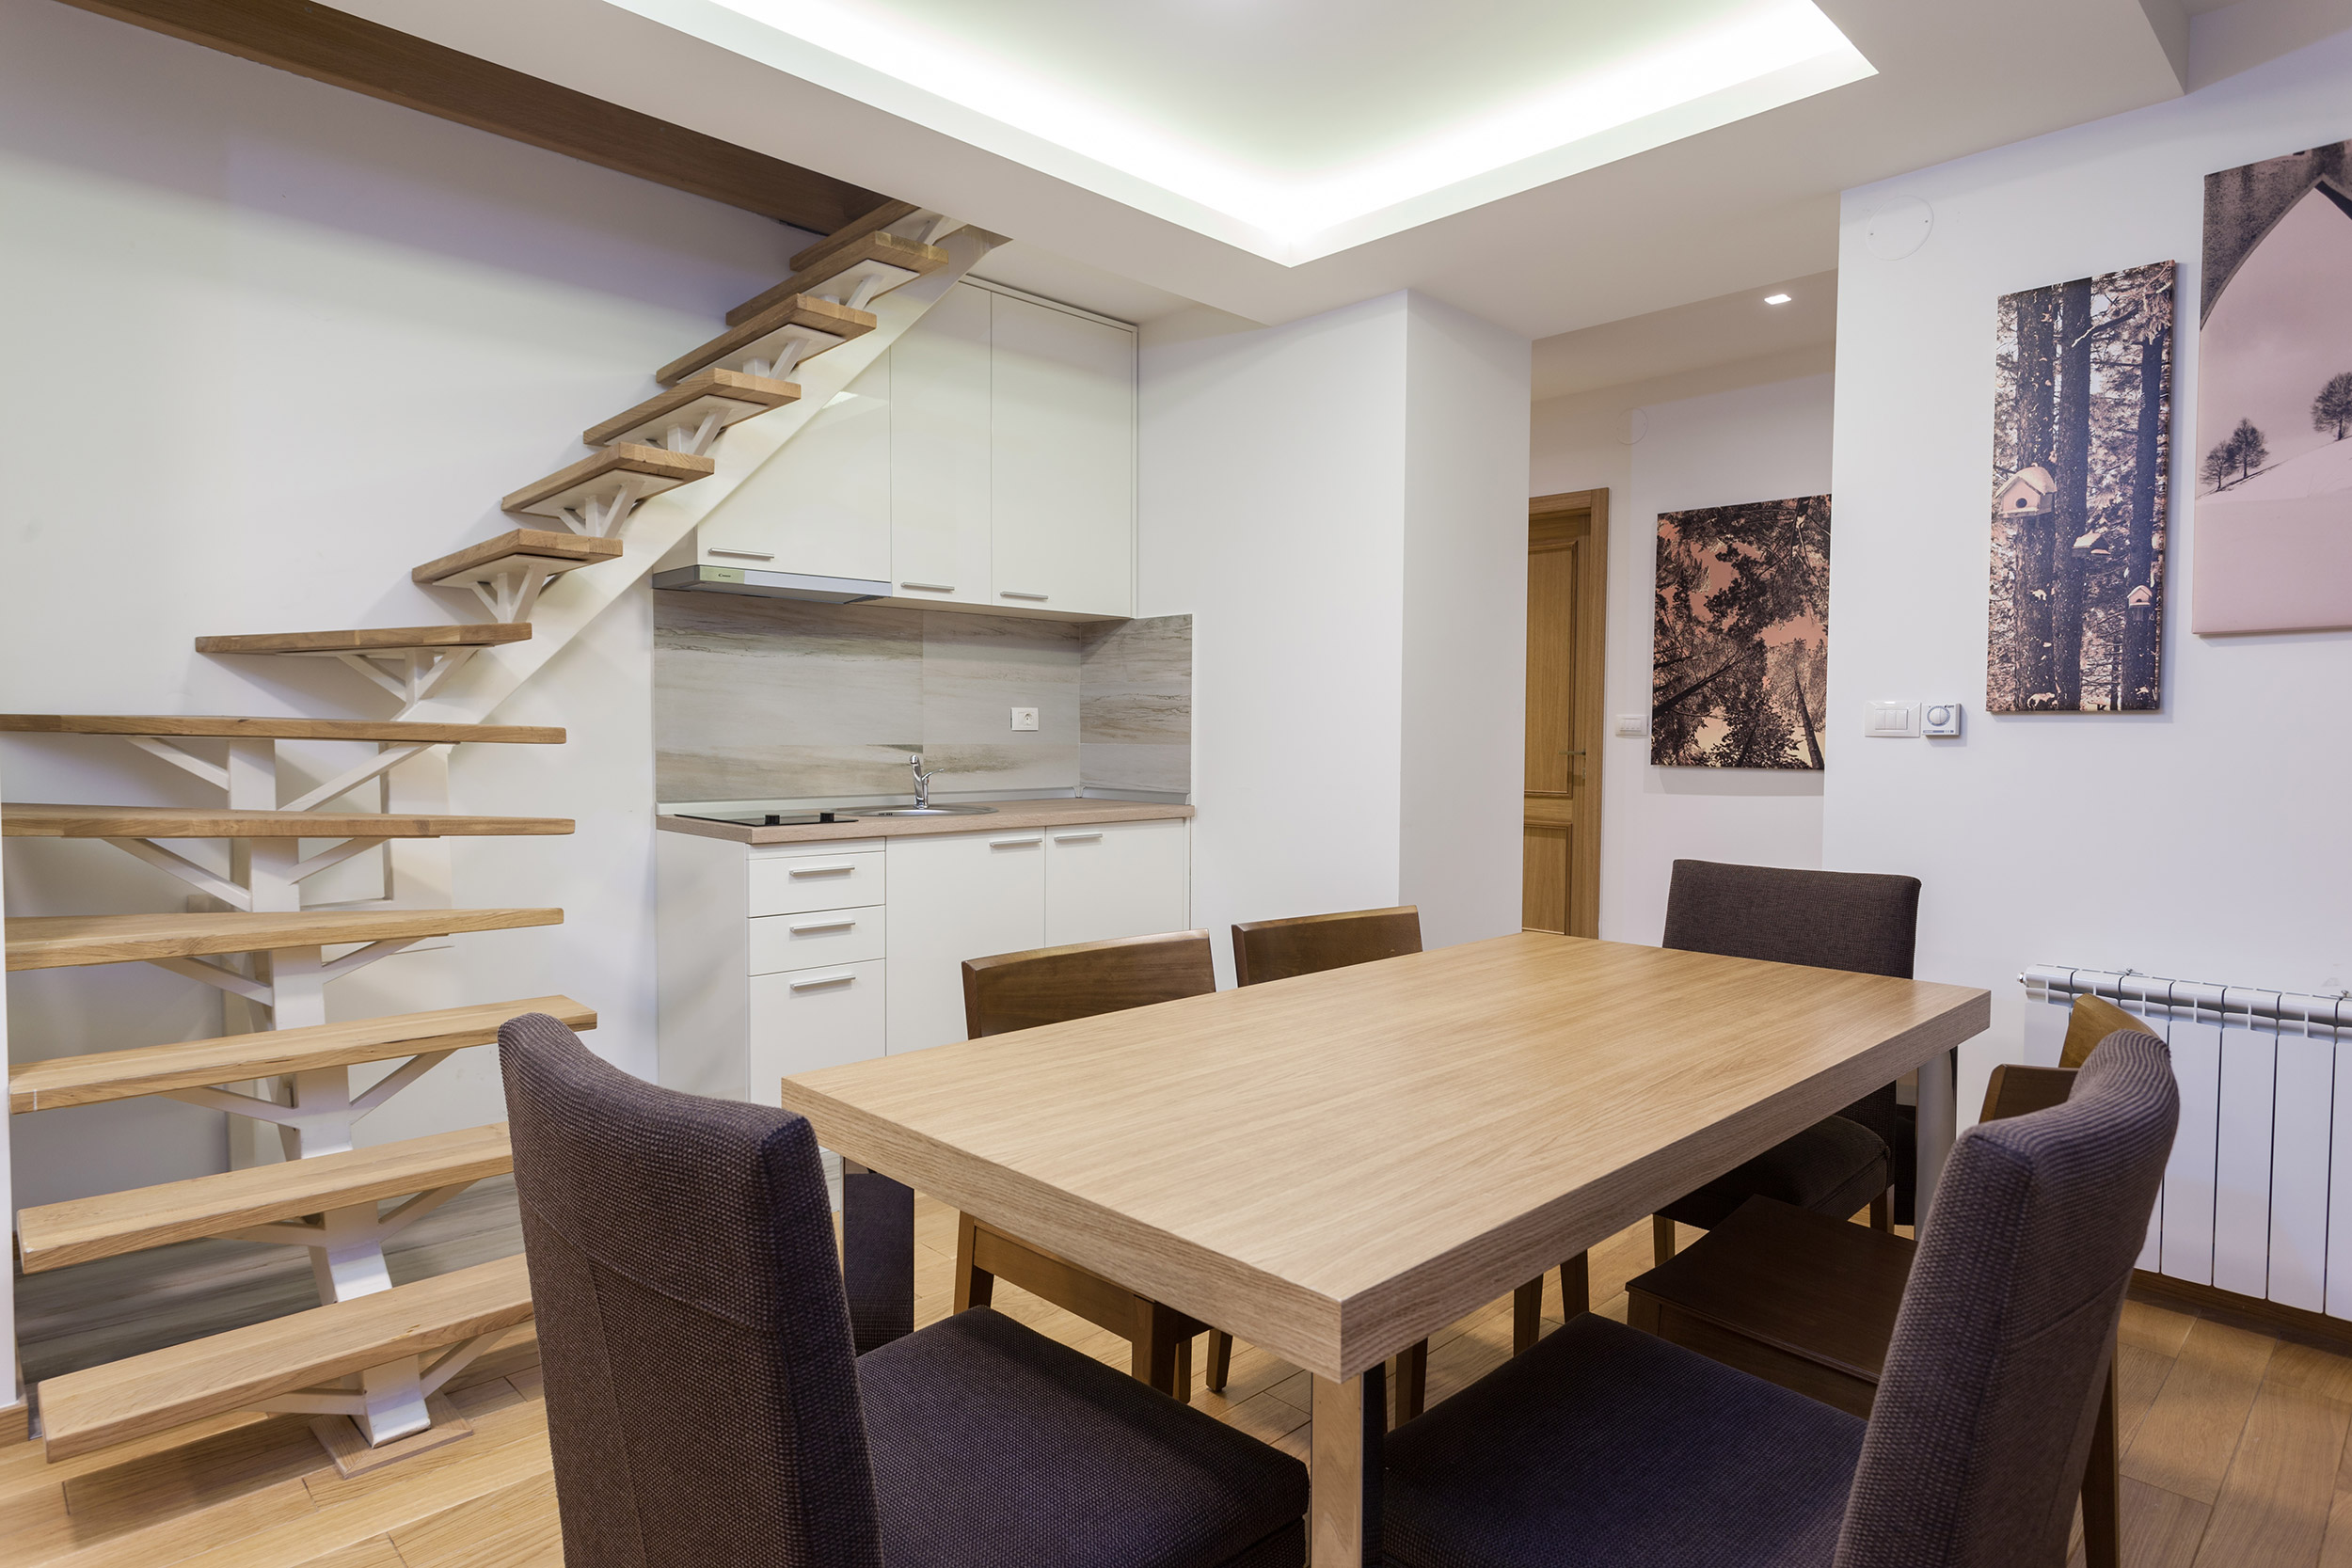 Vila borova trpezarija i kuhinja slider